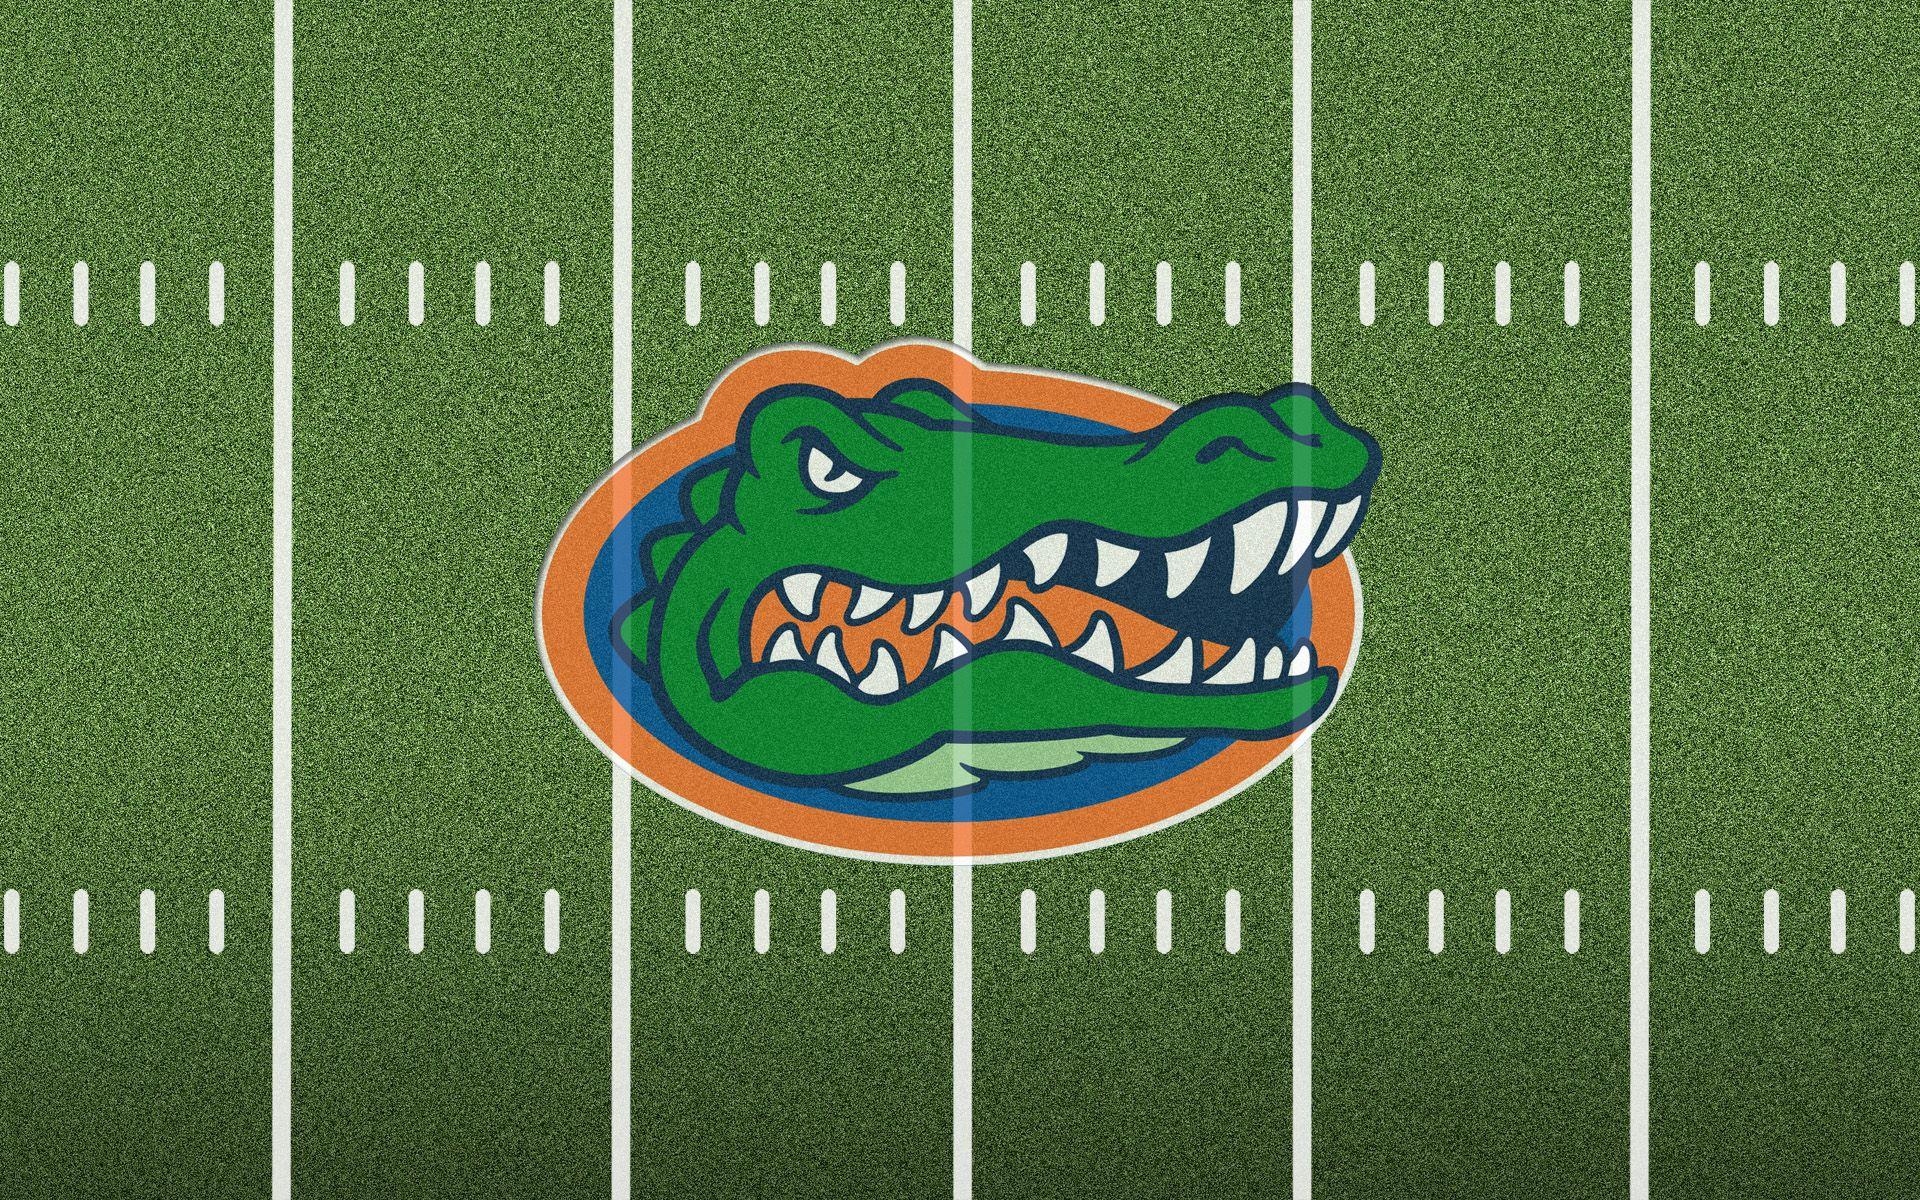 College Football Field Wallpaper Florida Gators Football Florida Gators Wallpaper Florida Gators